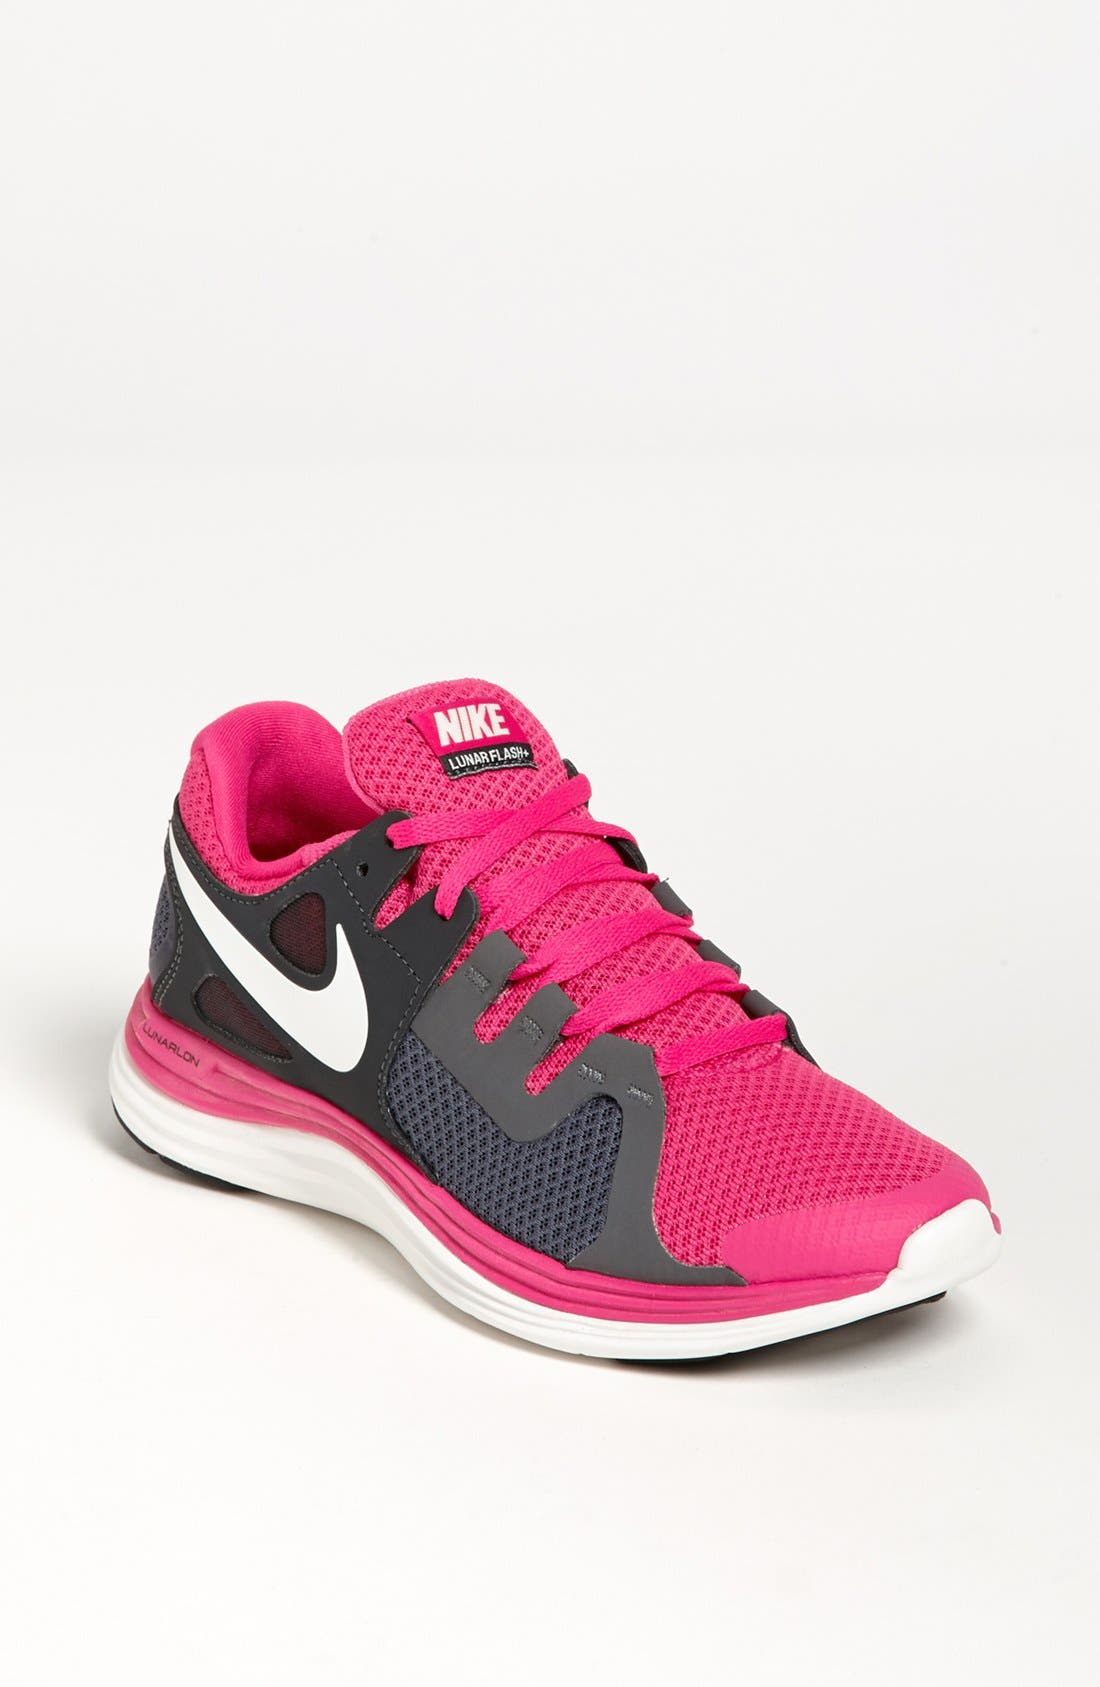 Main Image - Nike 'Lunarflash' Running Shoe (Women)